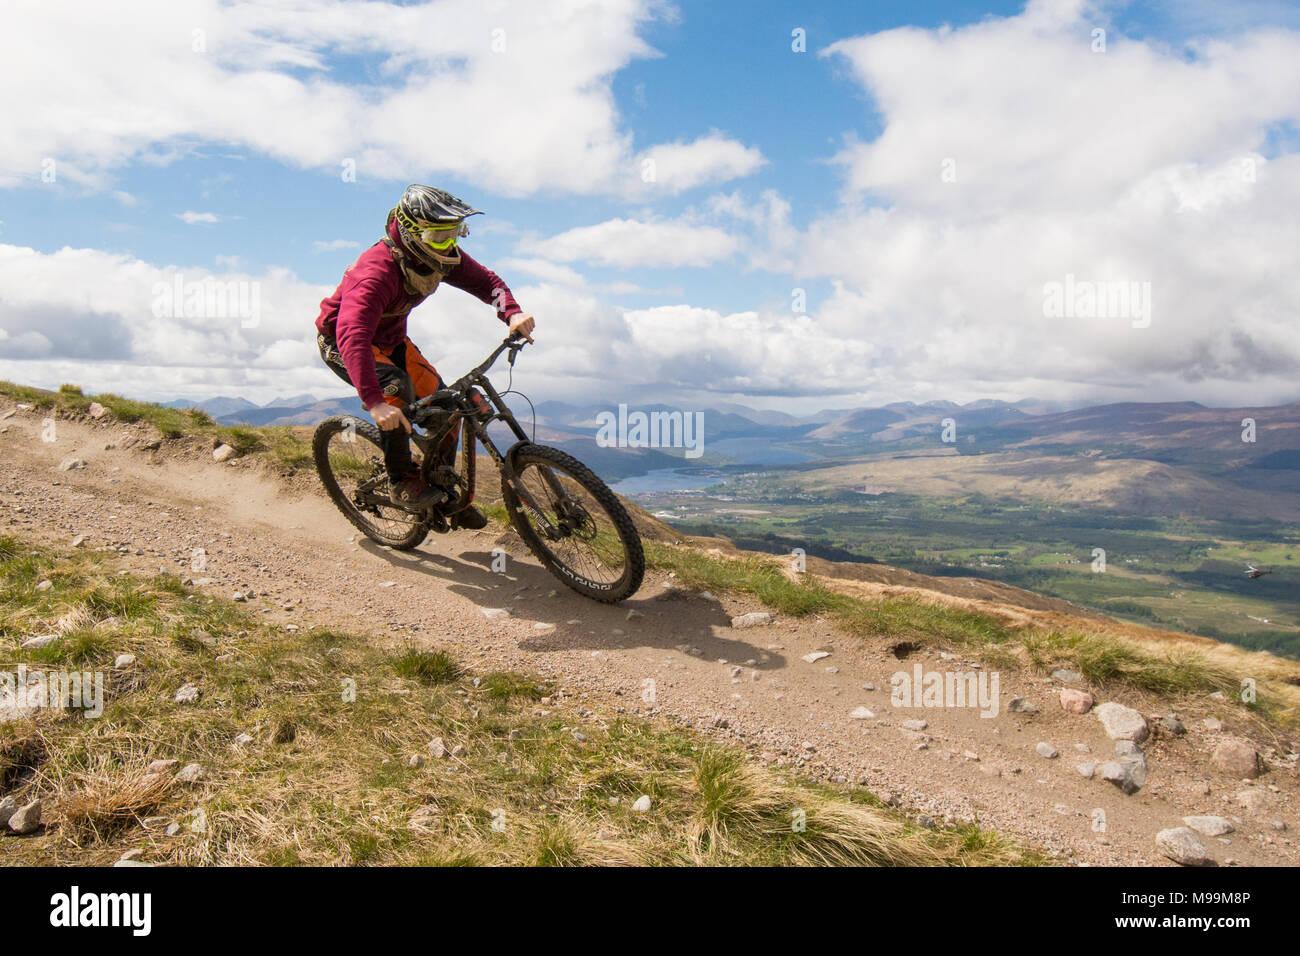 Mountain biker on downhill trail, Nevis Range, Fort William, Scotland, UK Stock Photo